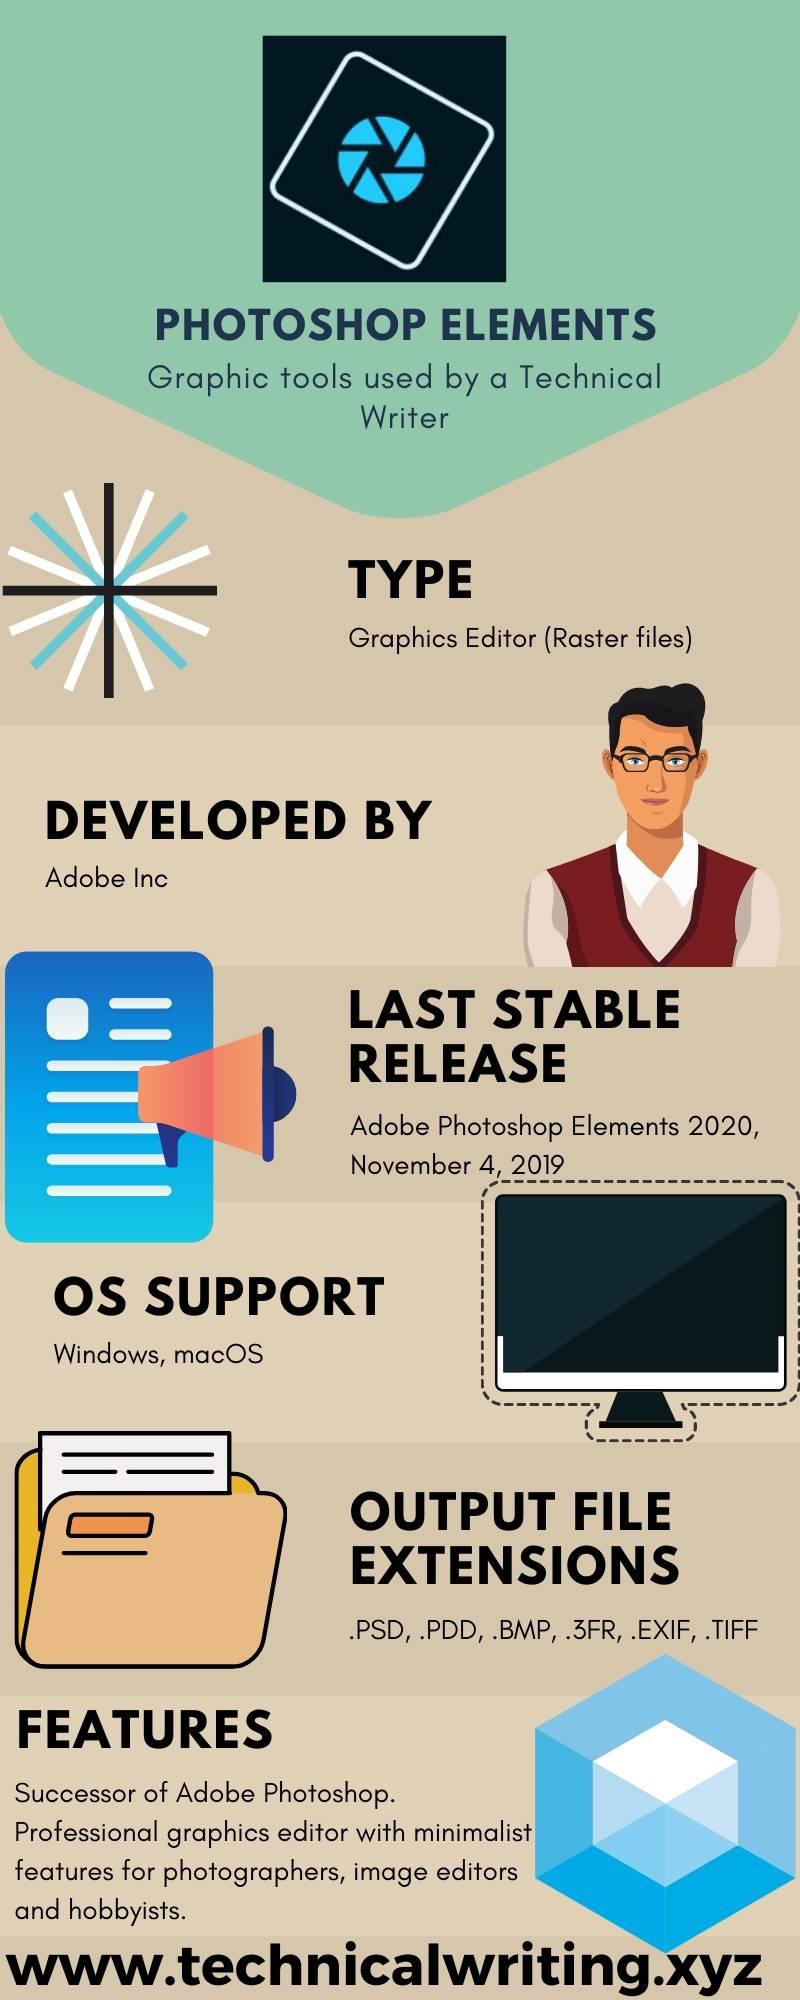 Adobe-photoshop-elements-tool